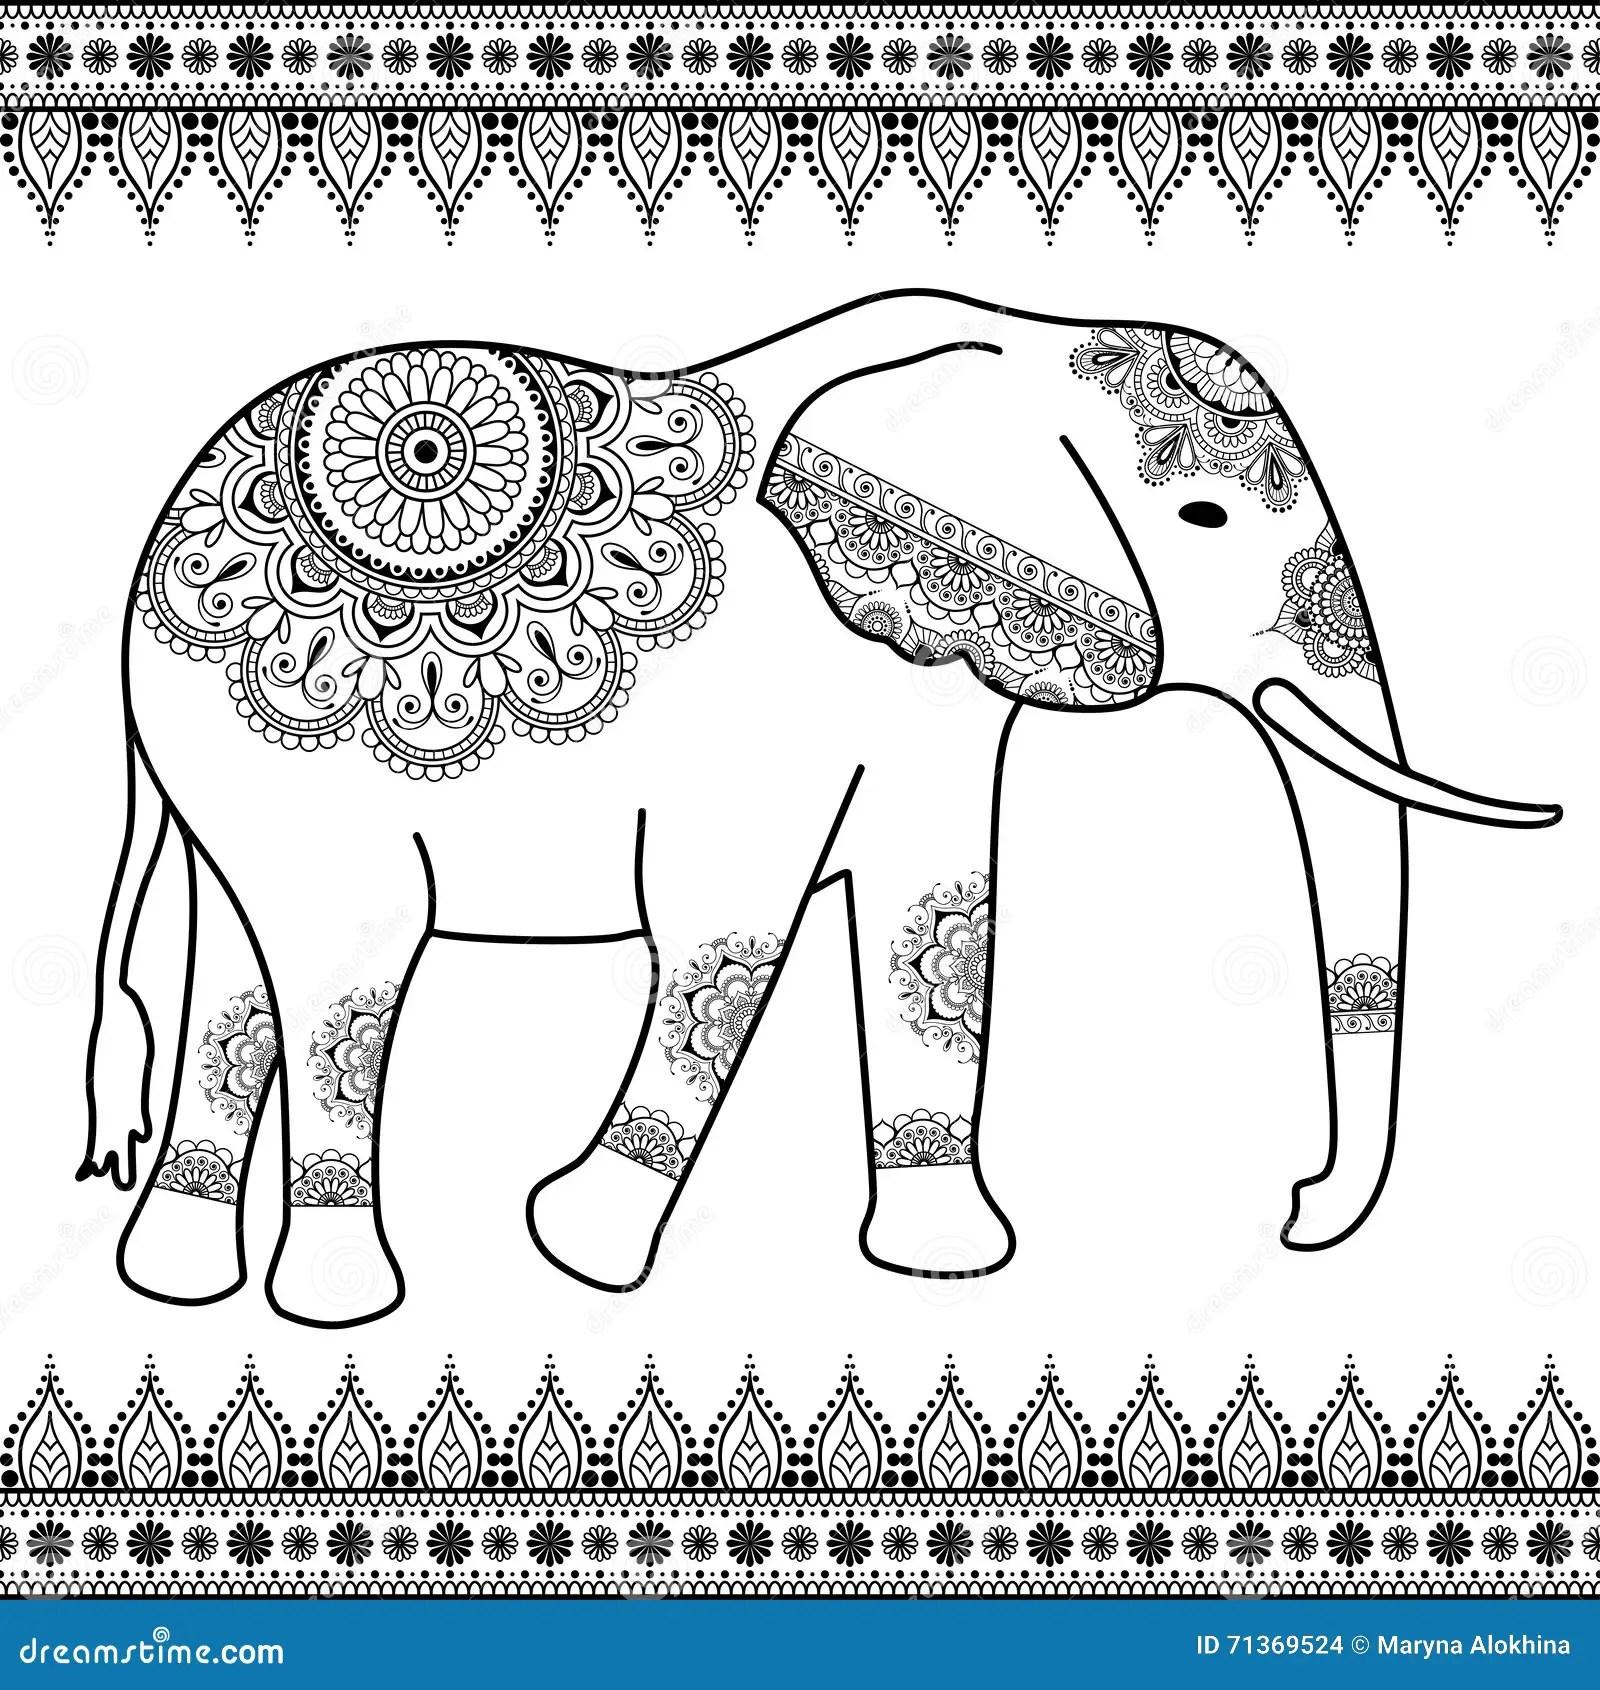 Elephant With Border Elements In Ethnic Mehndi Indian